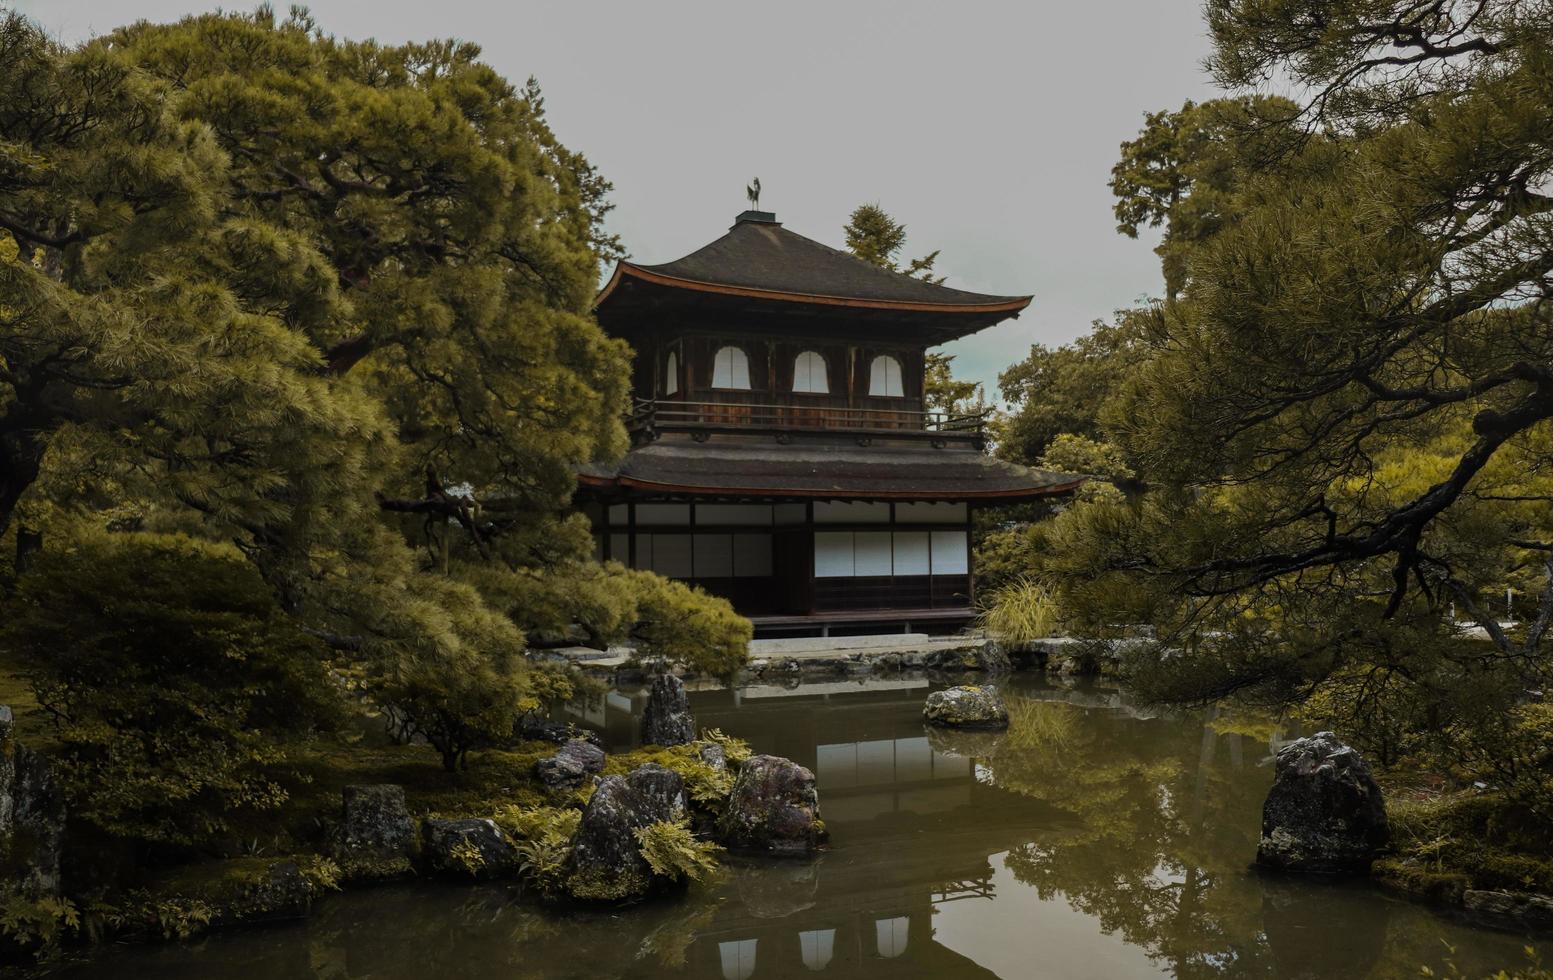 ginkaku-ji-tempel in kyoto, japan foto